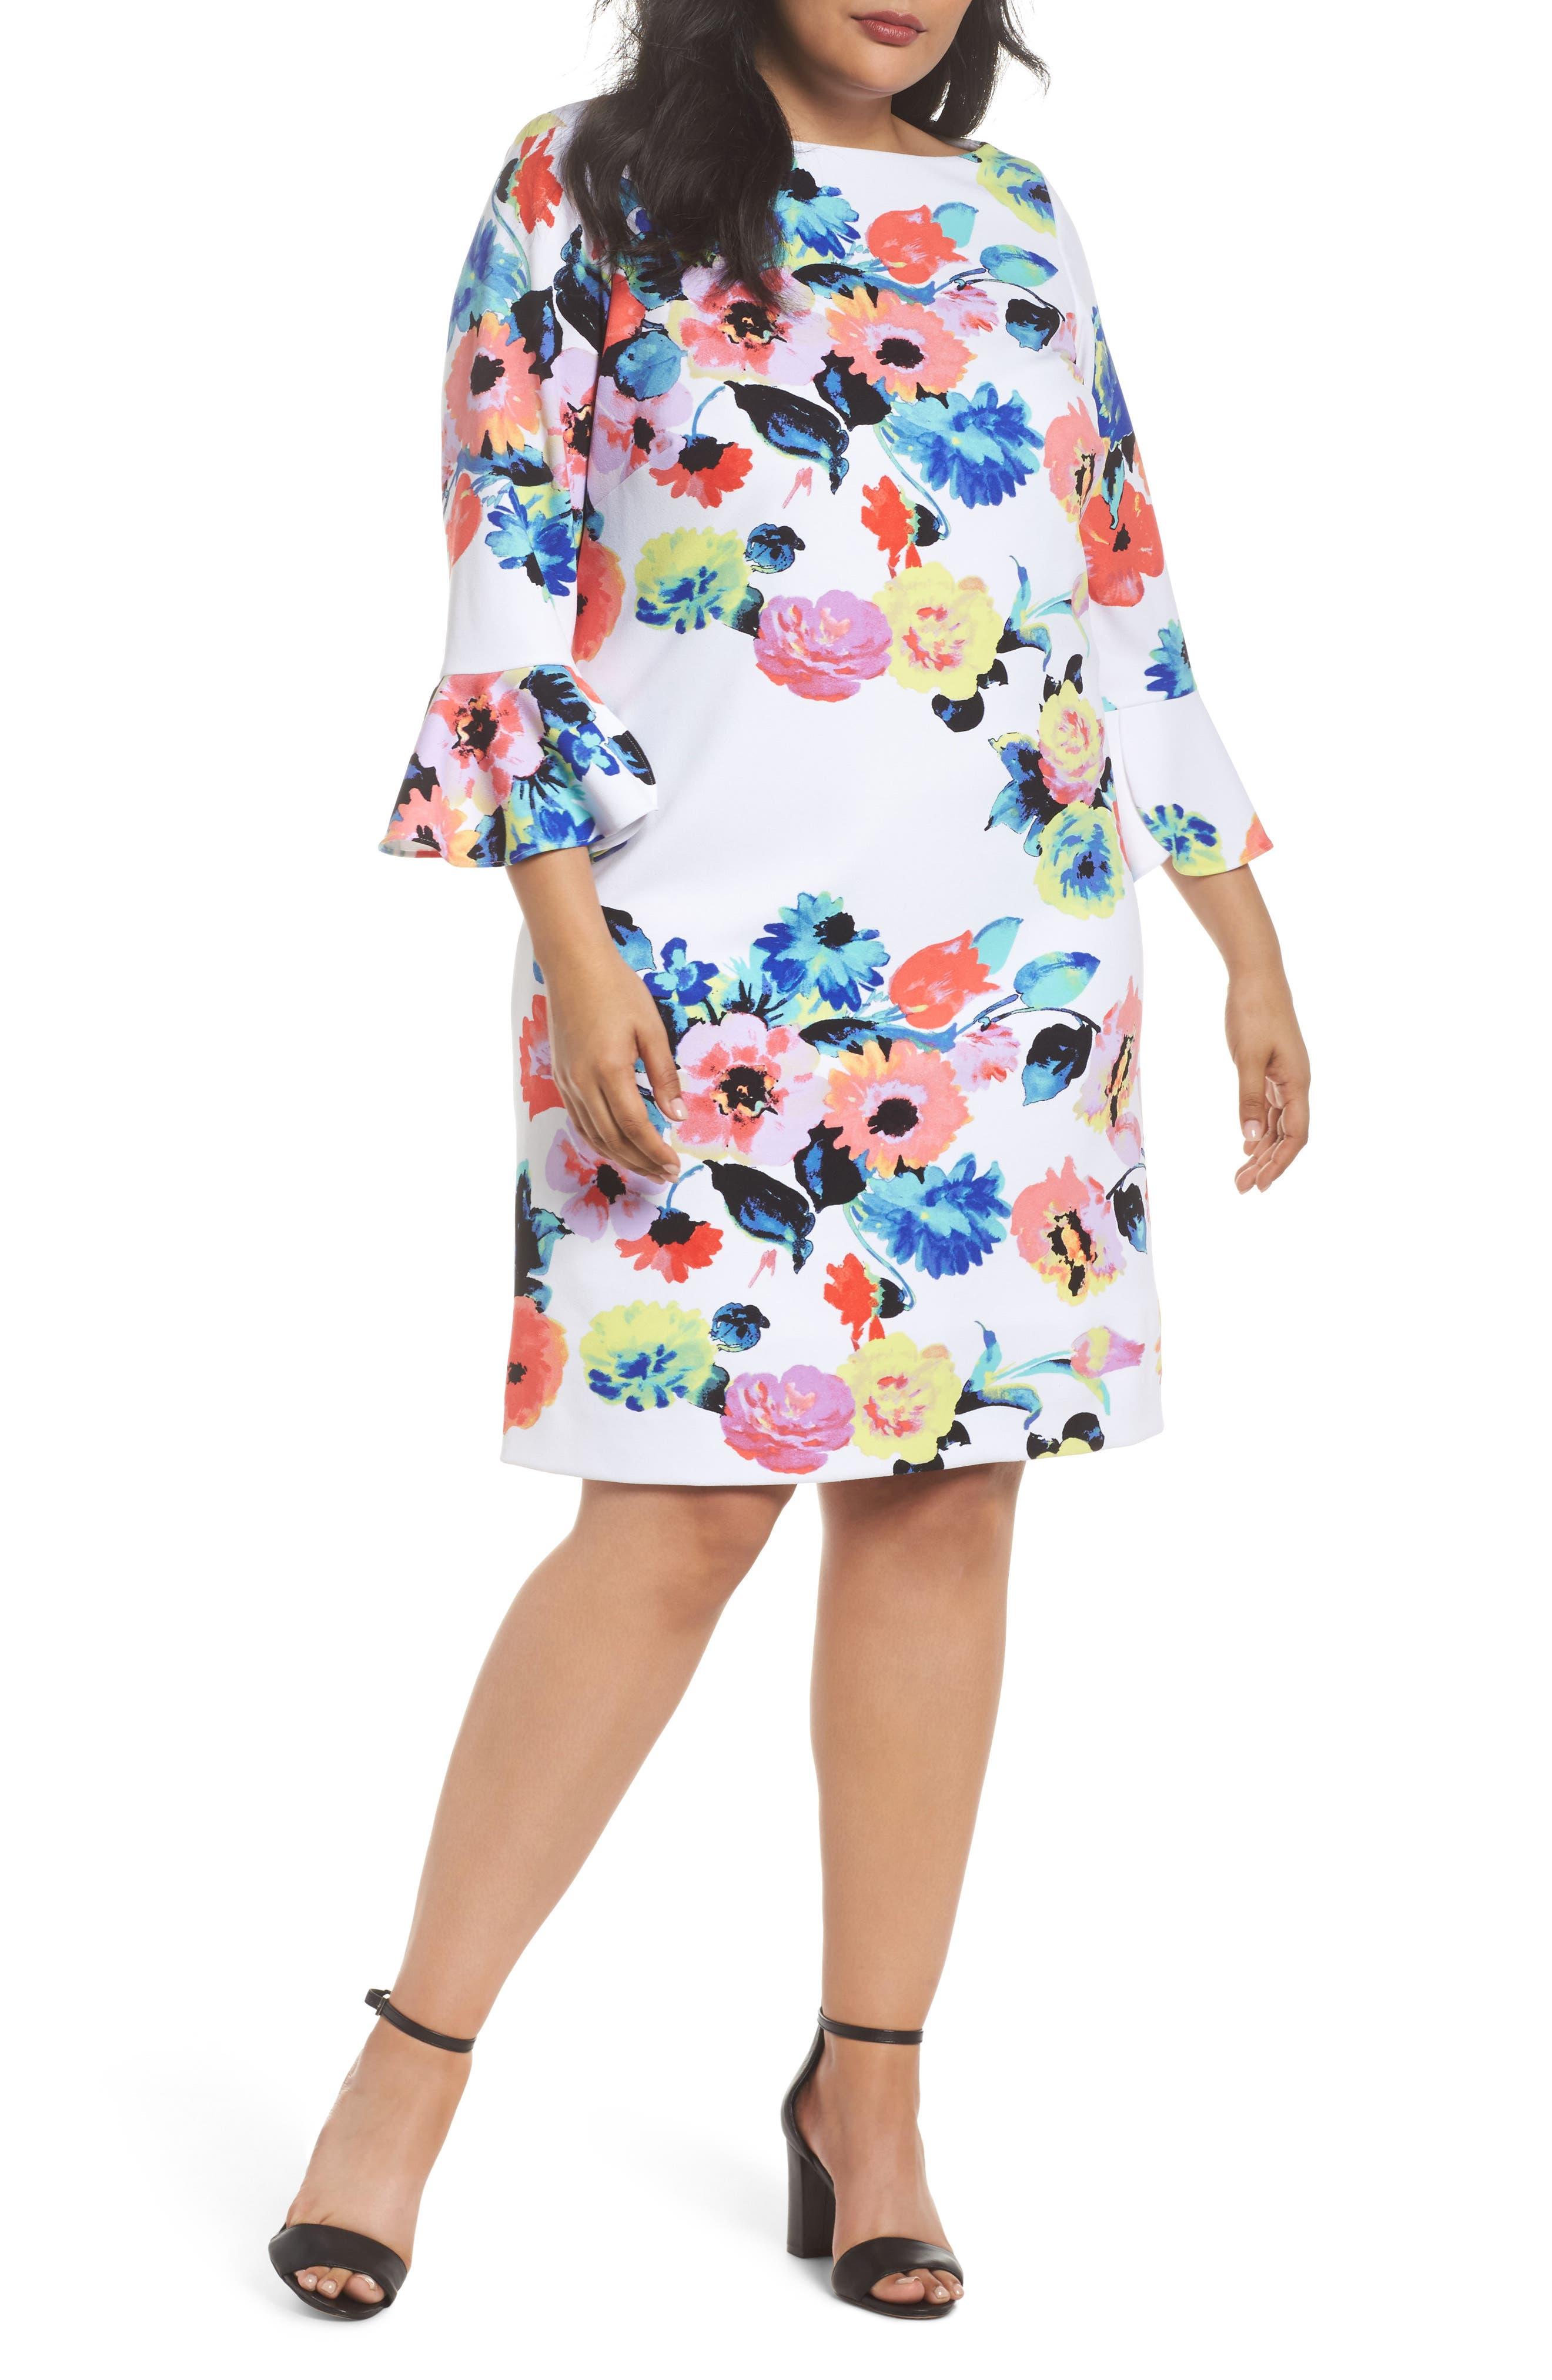 Alternate Image 1 Selected - Tahari Floral Print Shift Dress (Plus Size)